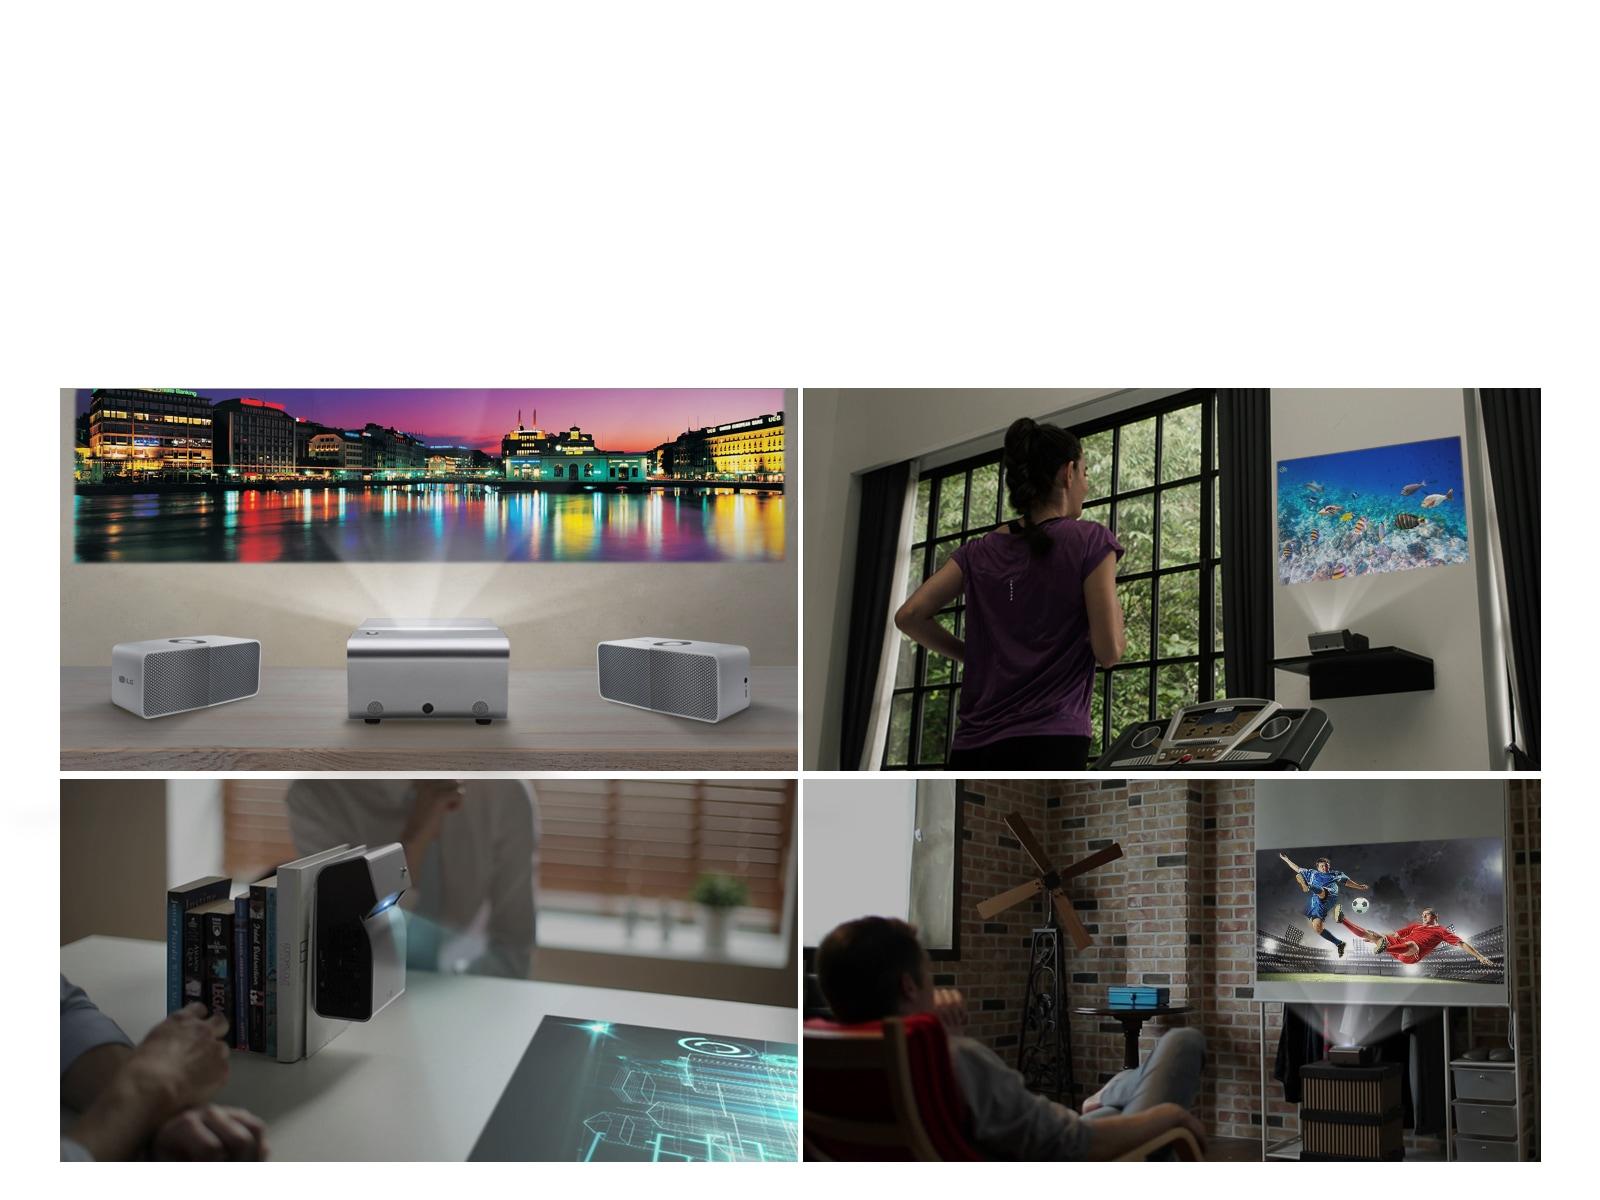 02-Simple-&-Beautiful-Installation_Desktop